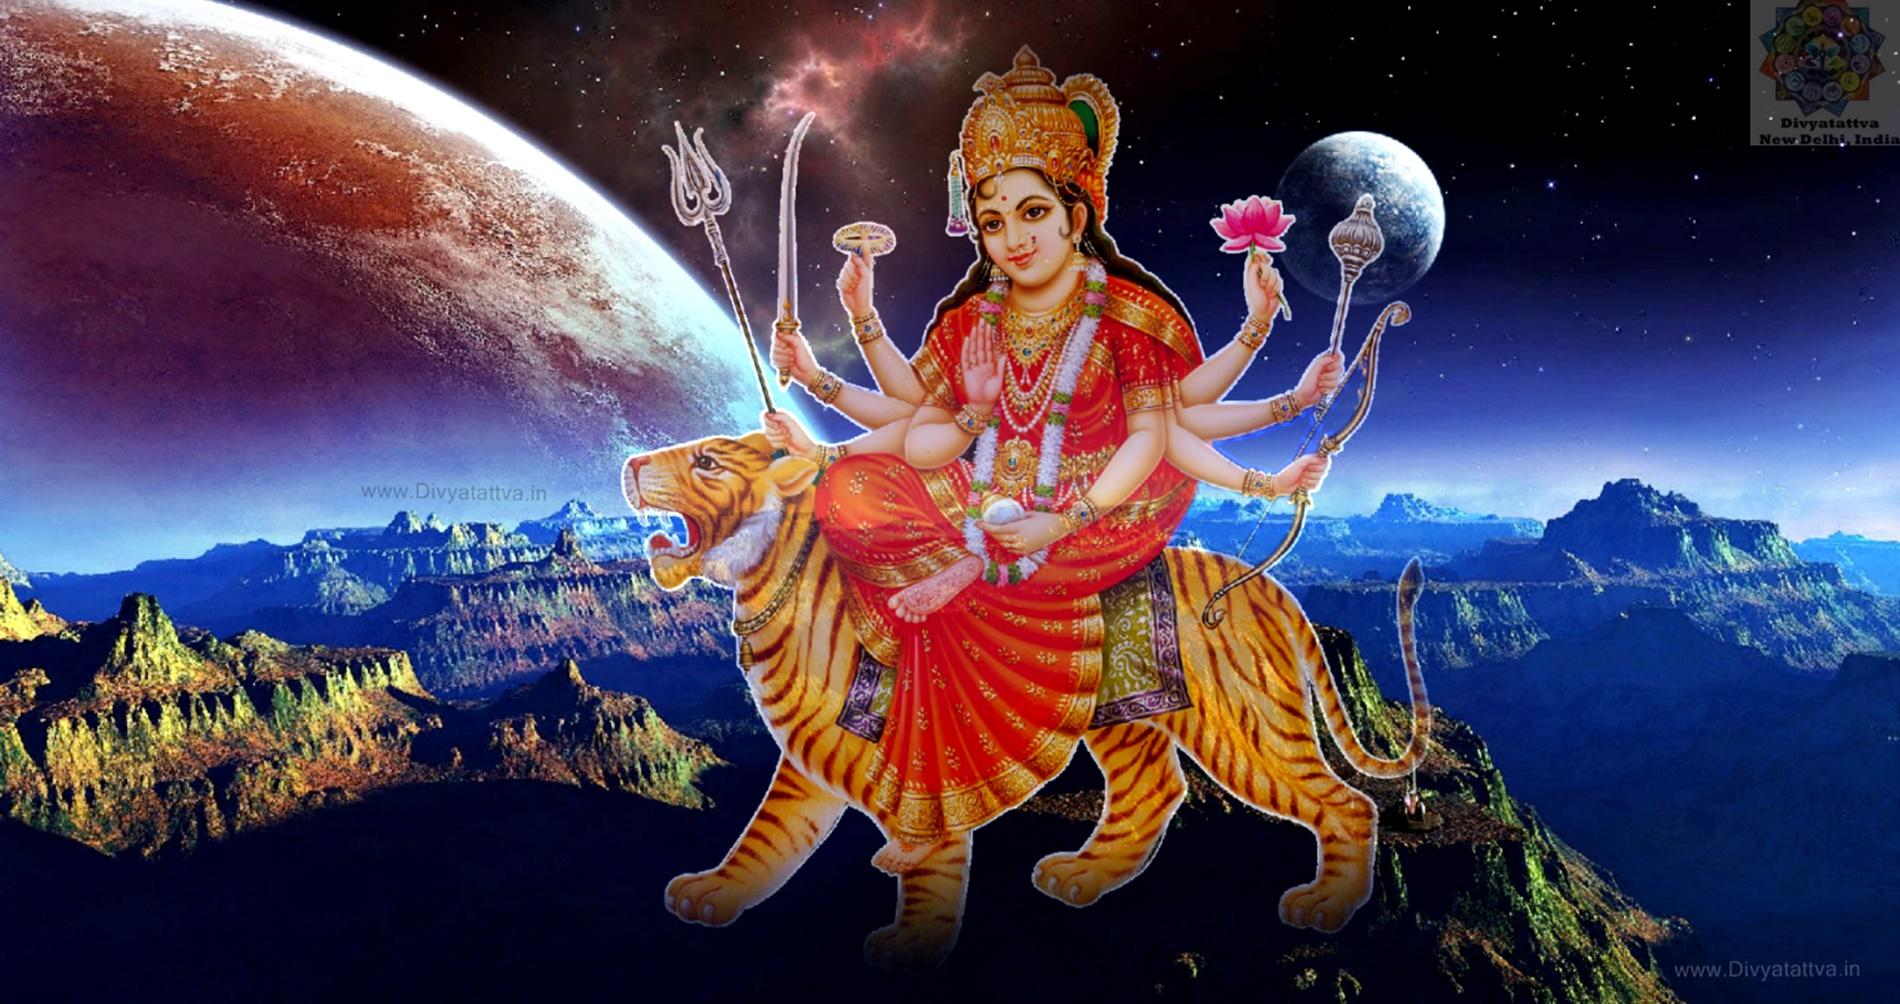 Durga Devi, Durga Maa ka Photo Sherawali, Goddess Shakti, Hindu Goddess Durga Devi Images